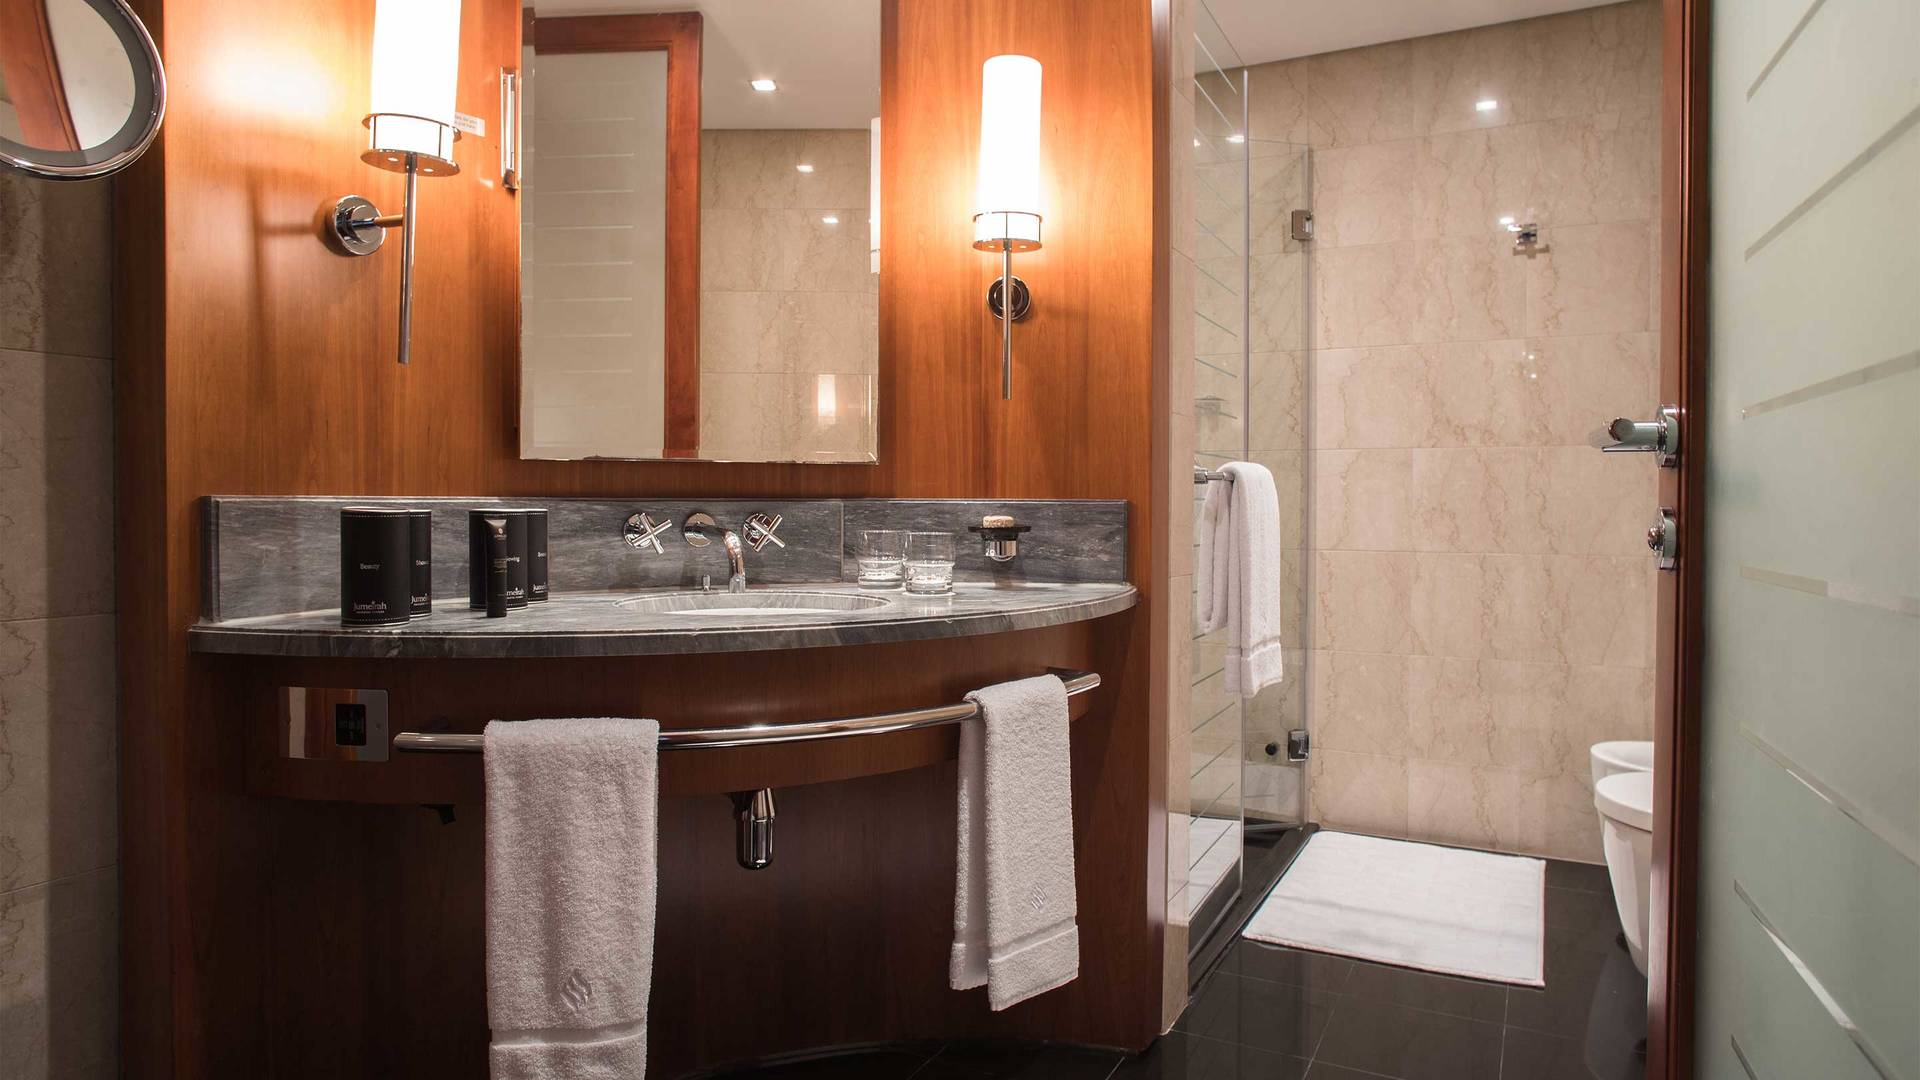 16-9 Jumeirah-Emirates-Towers---Deluxe-Room-Bathroom